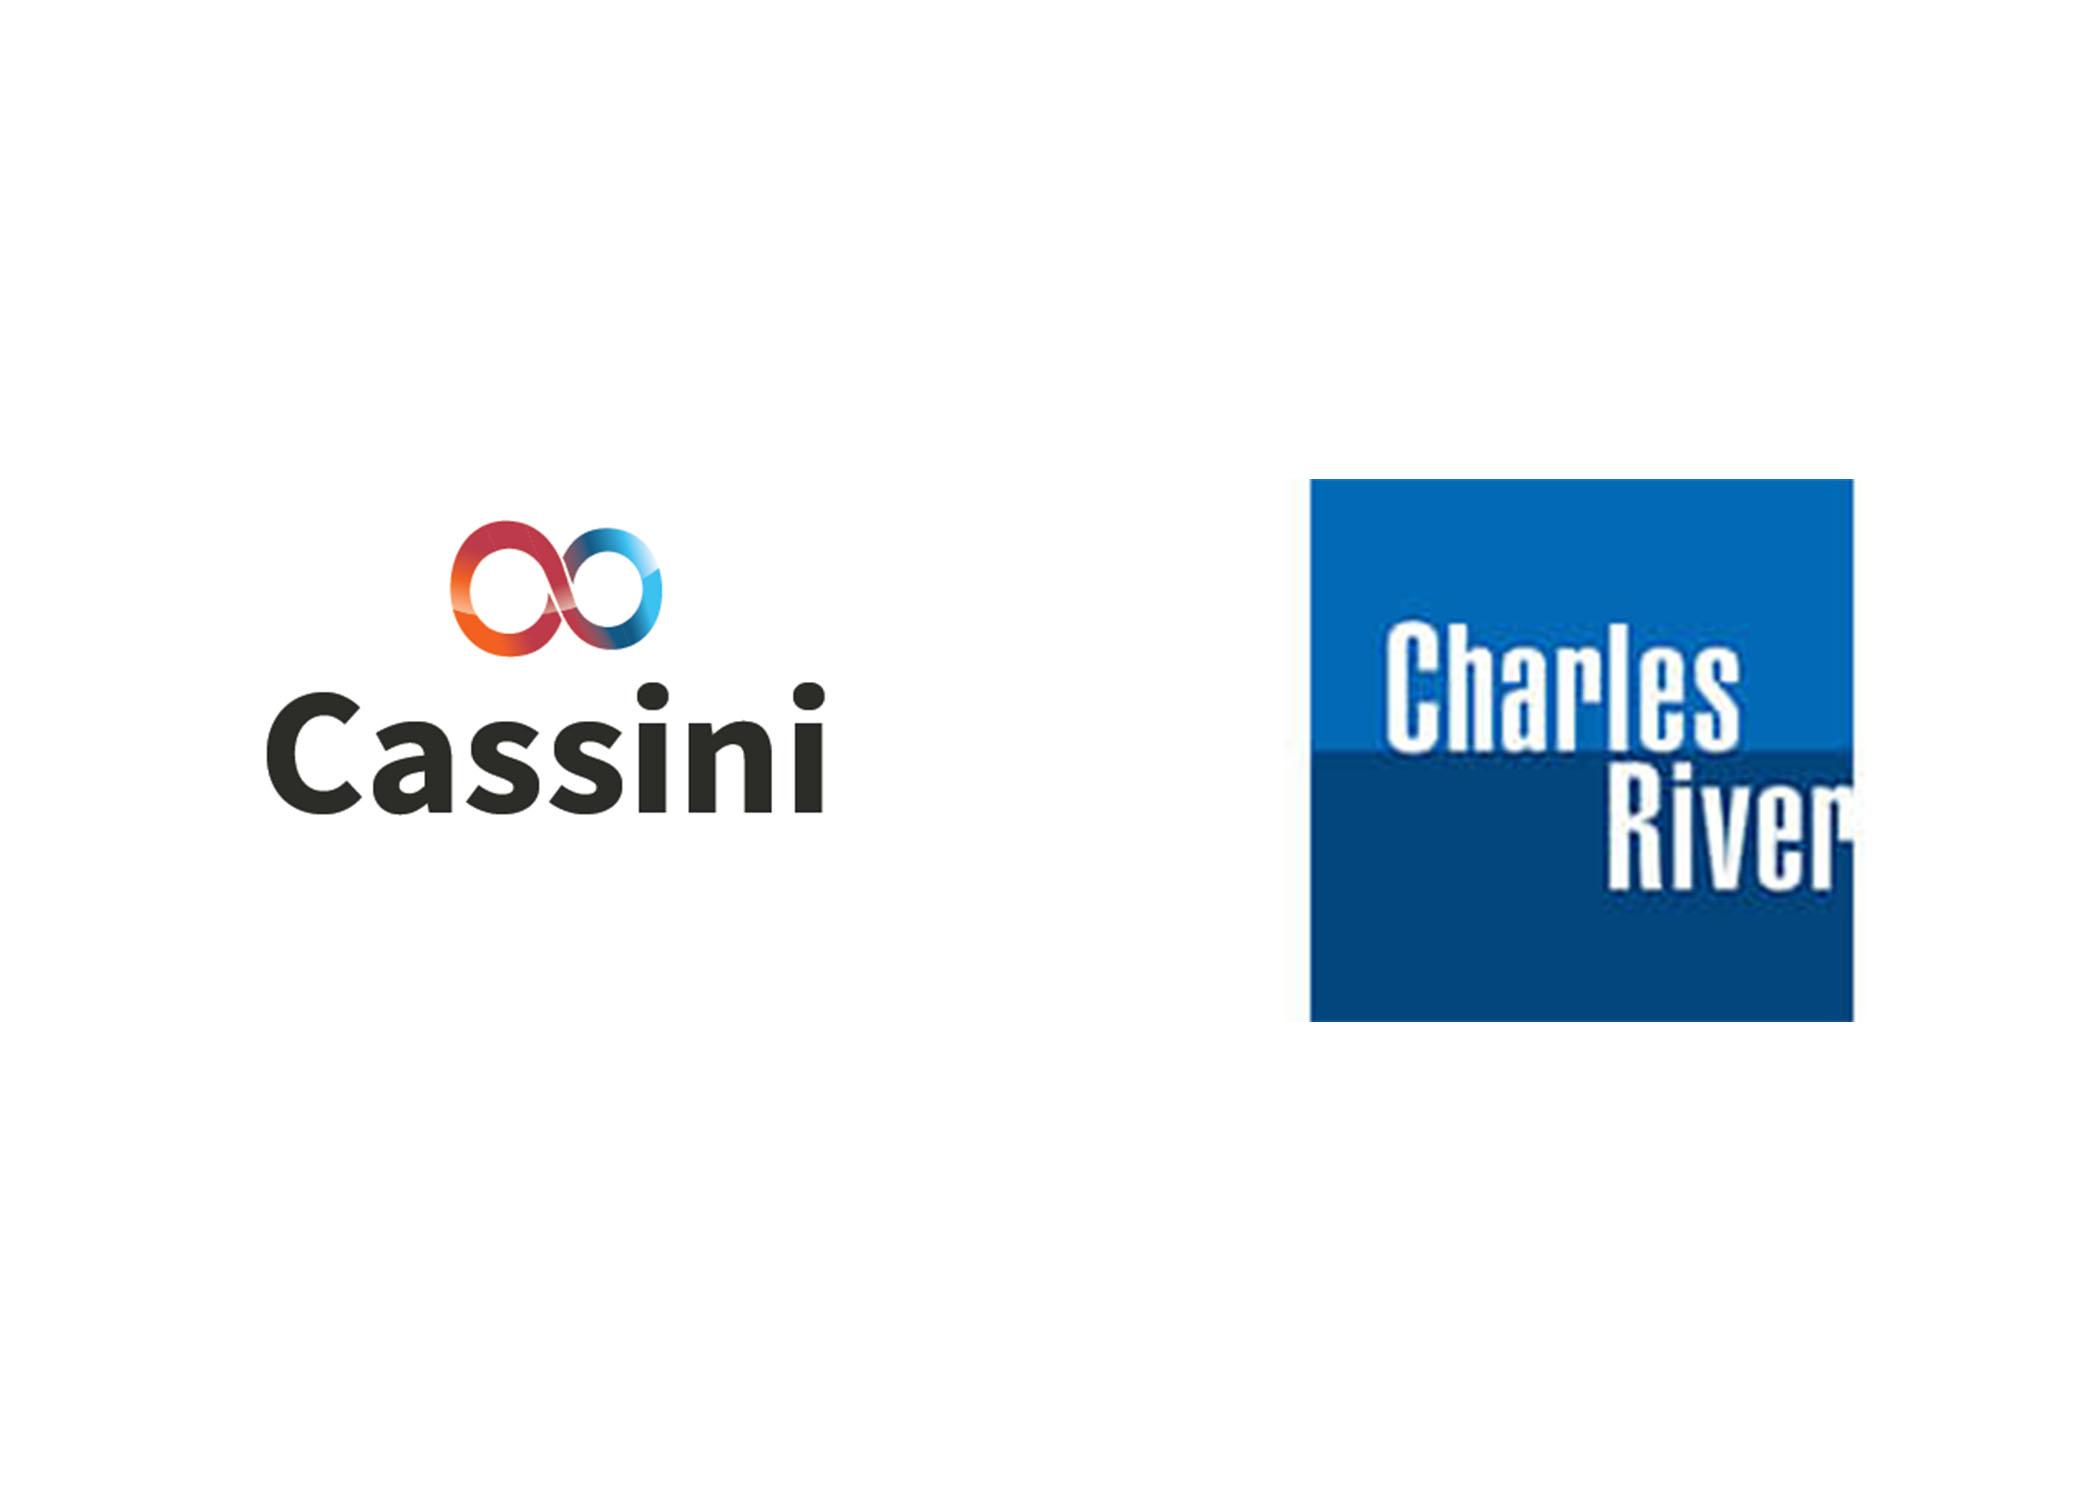 Charles river management trading system